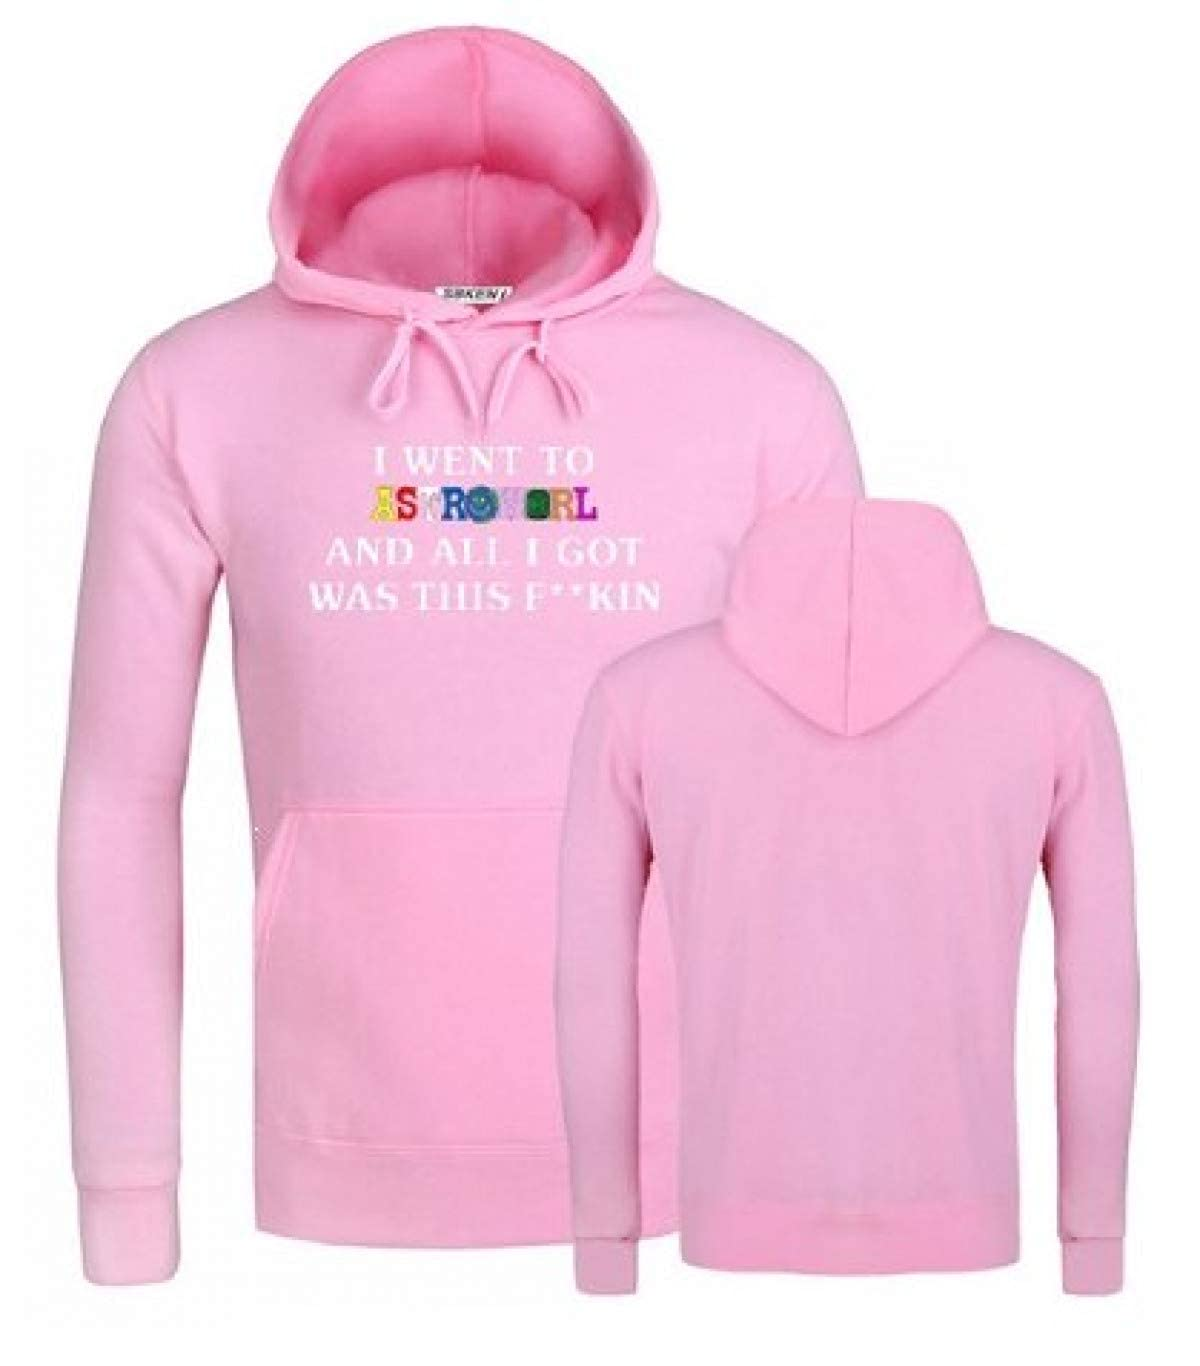 Amazon.com: WEEKEND SHOP Hoodies for Men ASTROWORLD Hooded Hoodies Men Women Clothes Hoodies Sweatshirt: Clothing